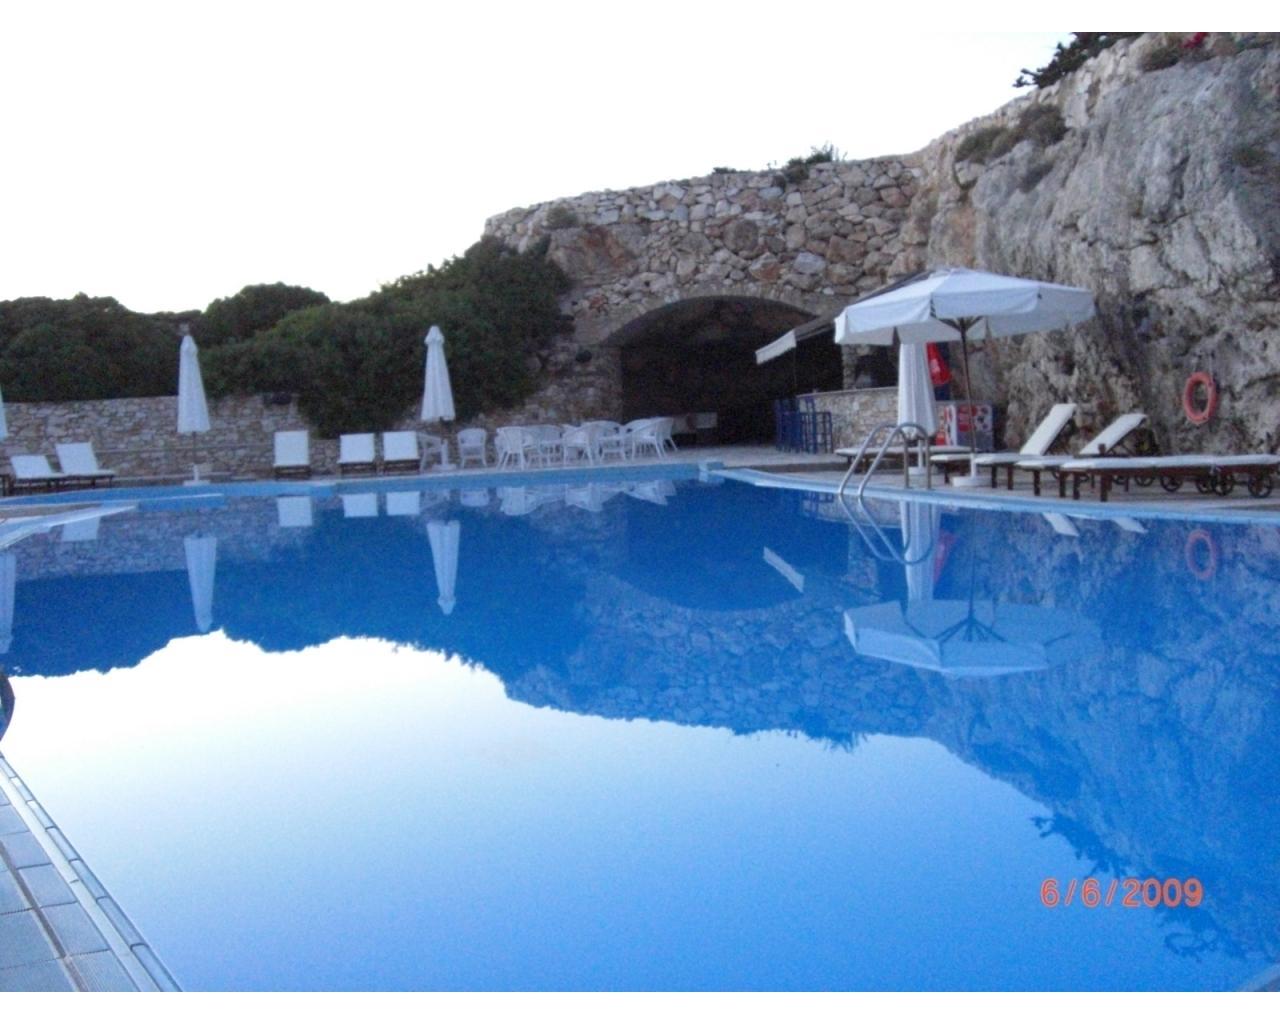 Bar woman at 5***** Hotel in Paros Island Greece (students)